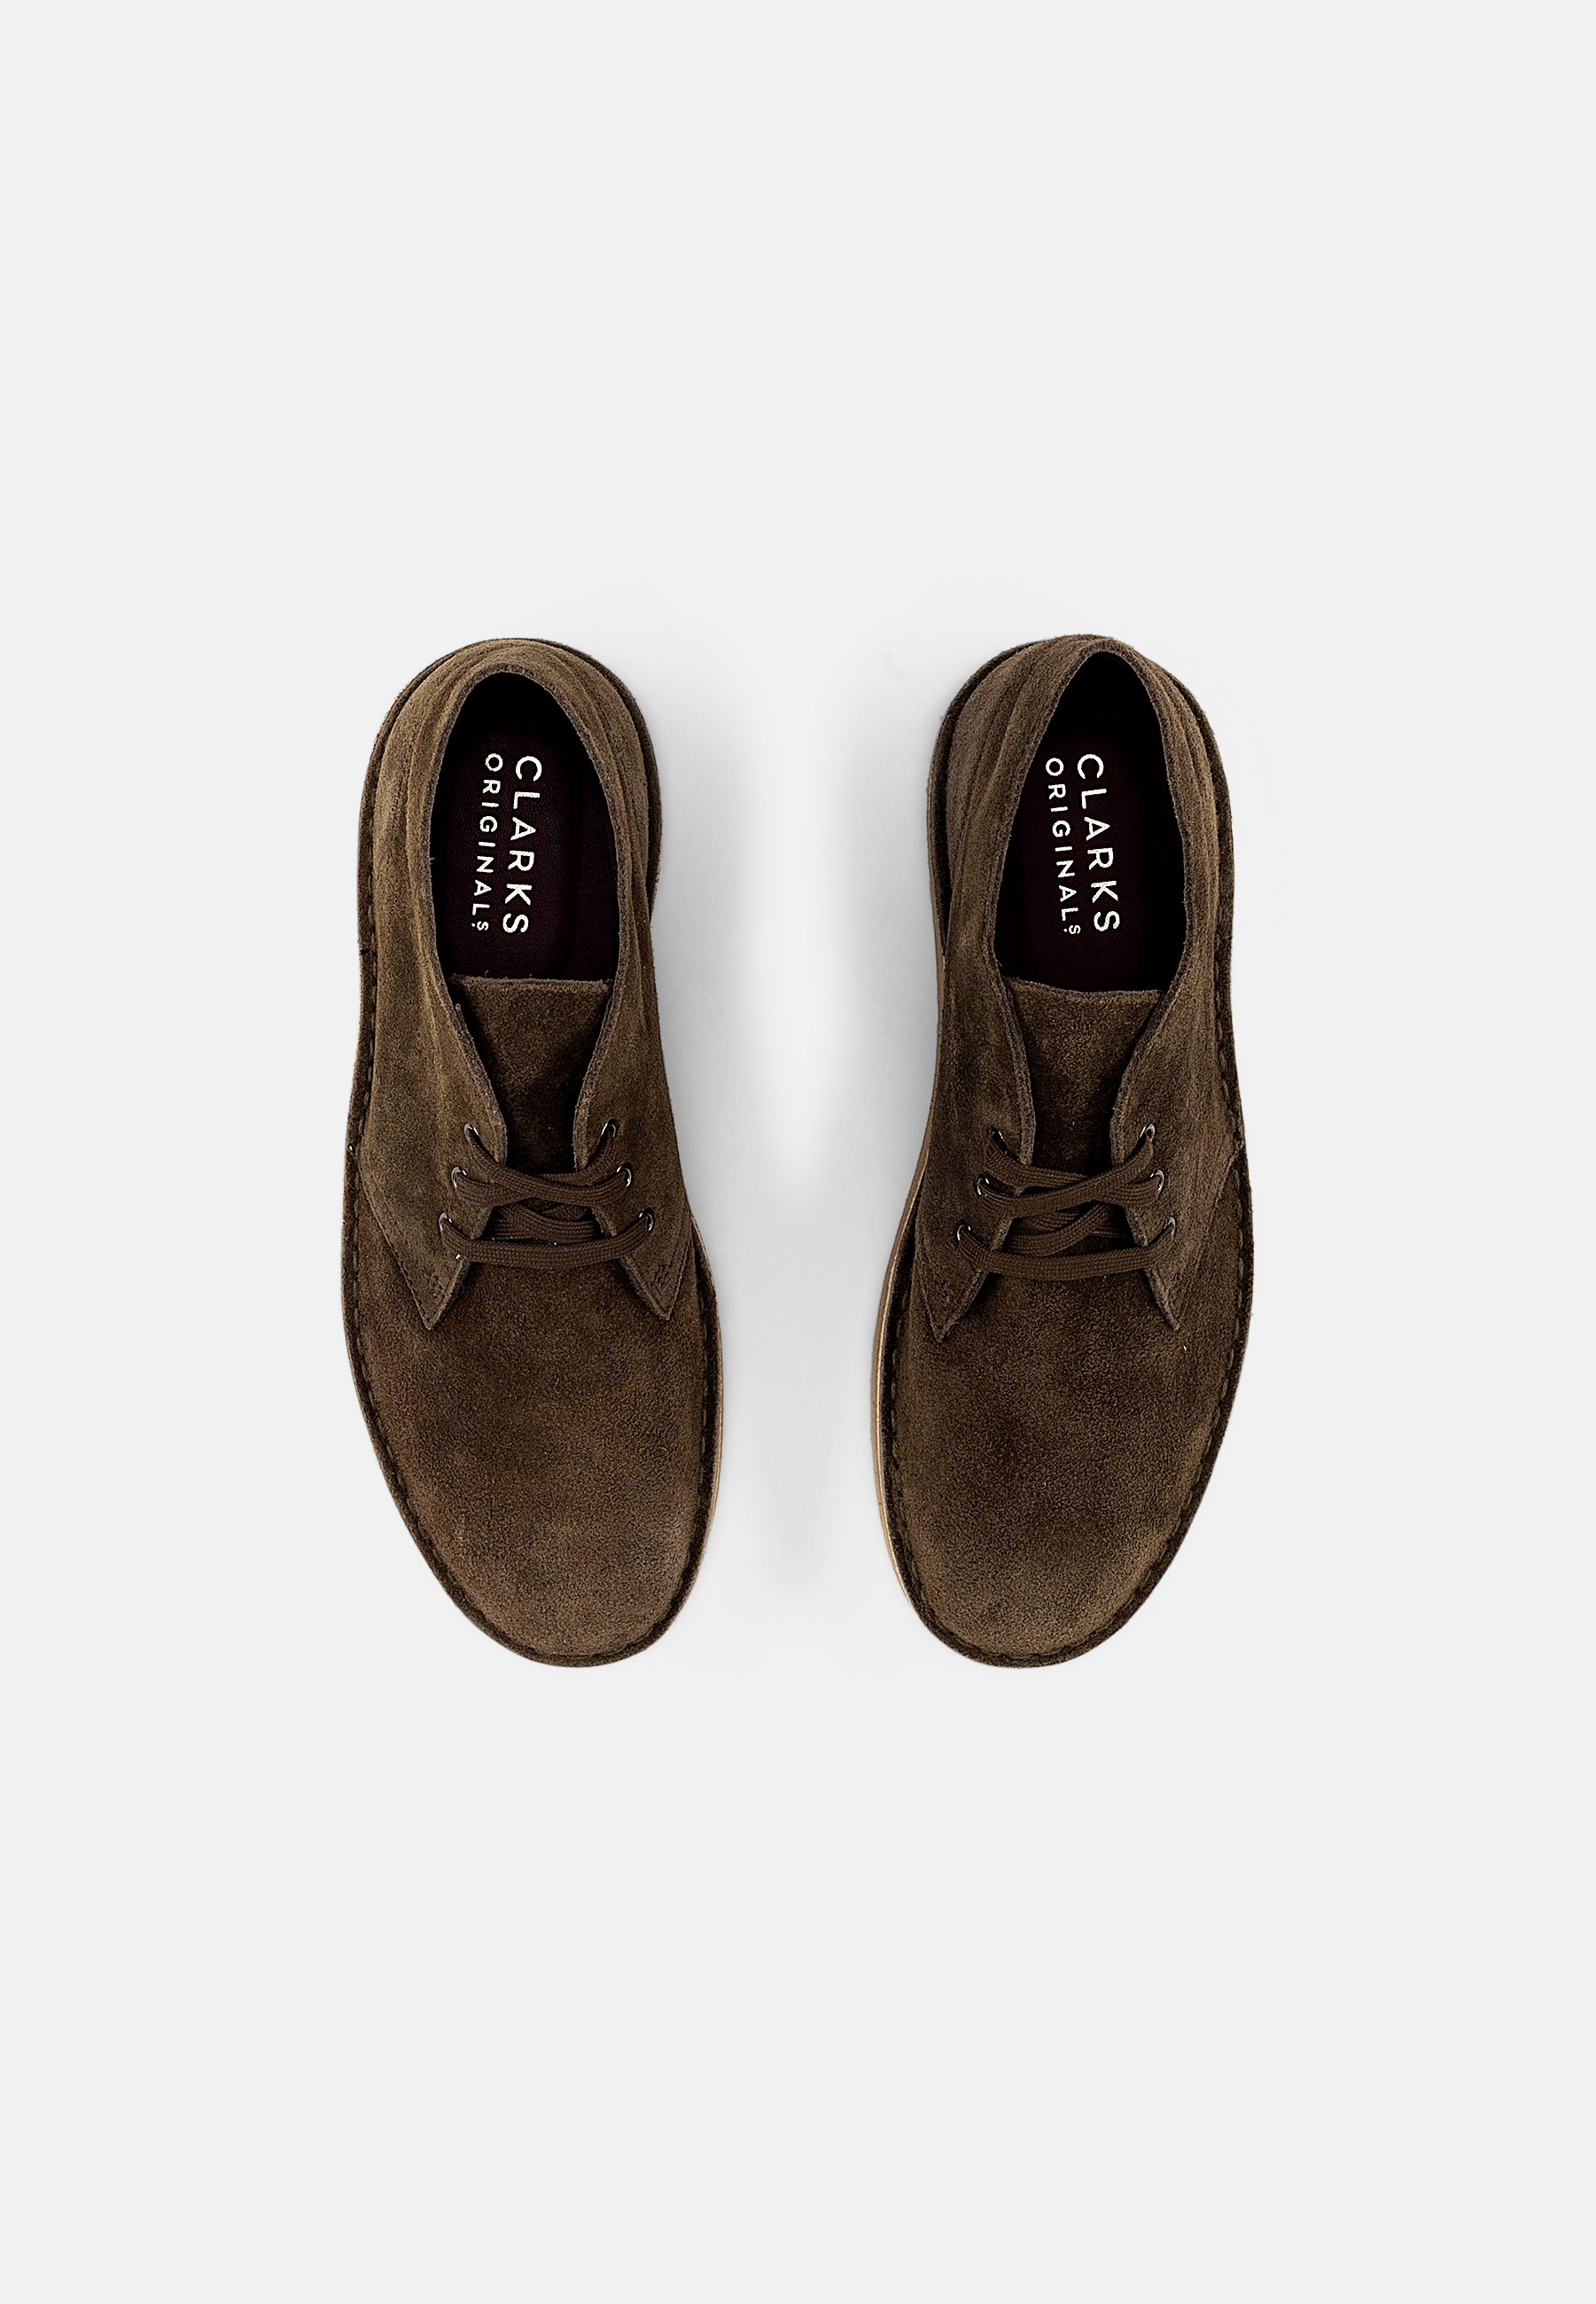 Homme DESERT COAL - Chaussures à lacets - olive